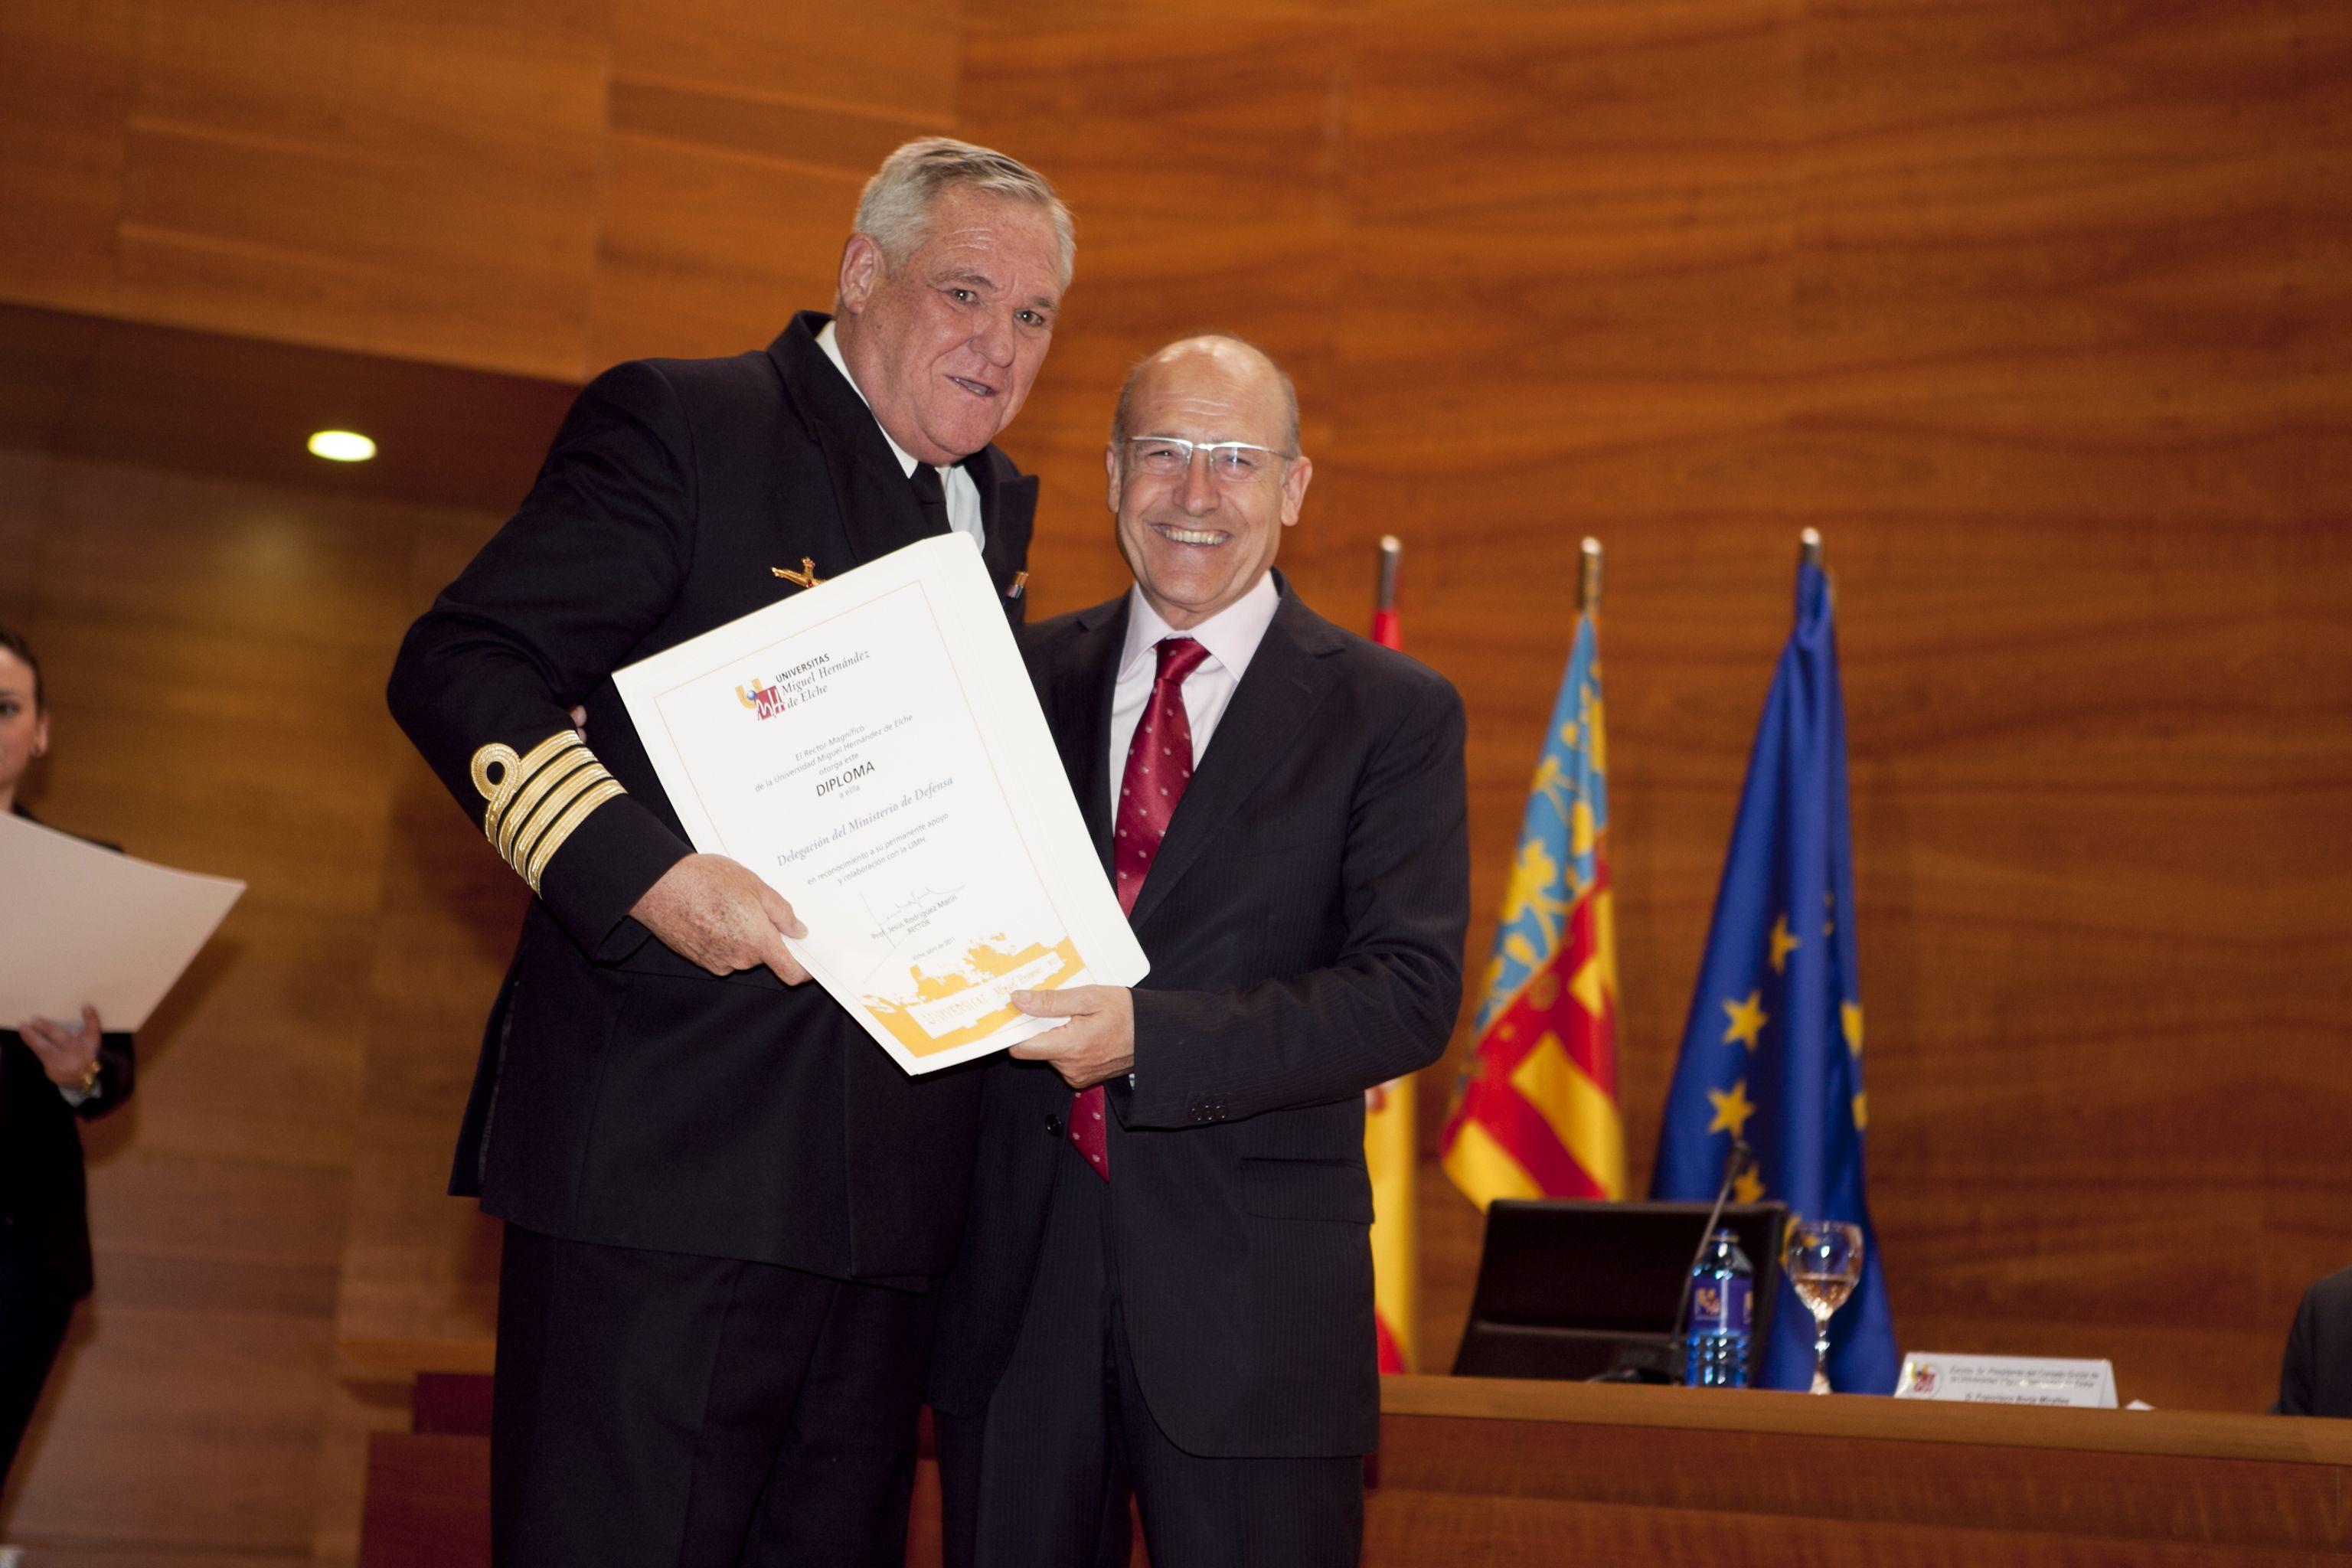 umh-diplomas-rector_mg_6995.jpg